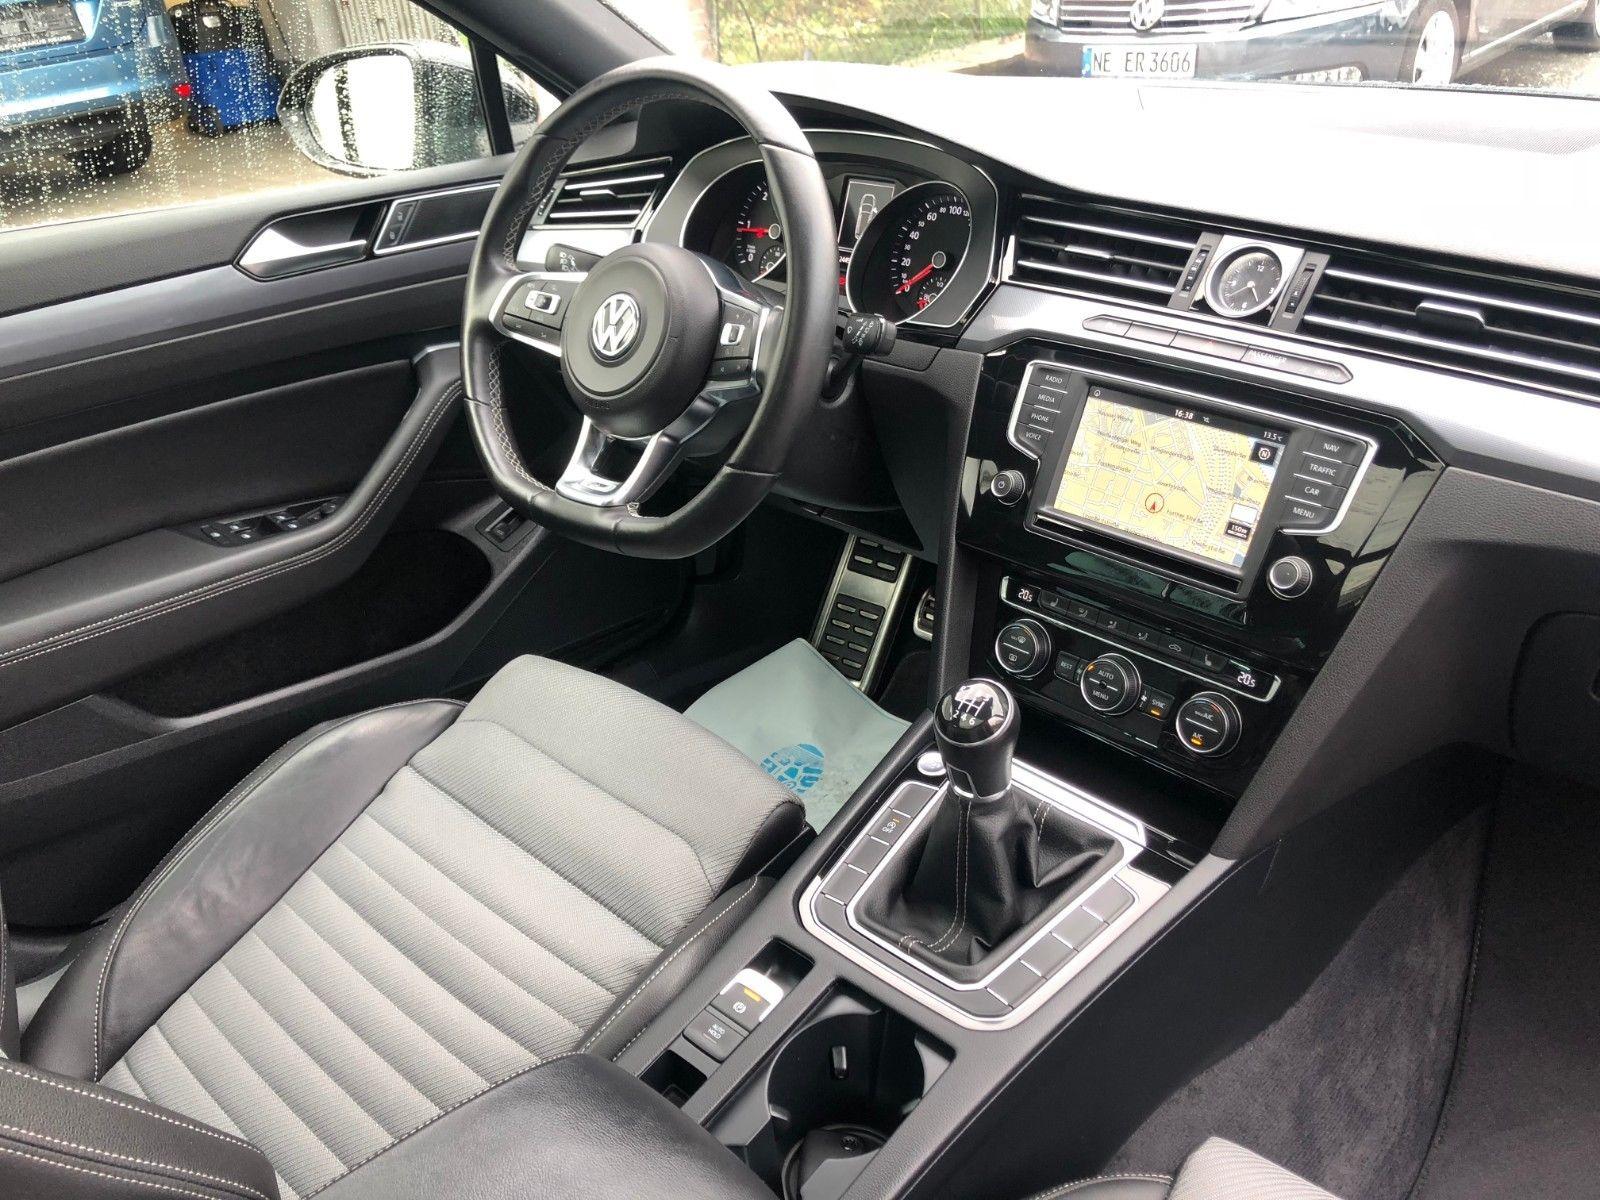 Volkswagen Passat Variant 2.0 TDI R-Line Interieur*Pano*LED - Deine ...